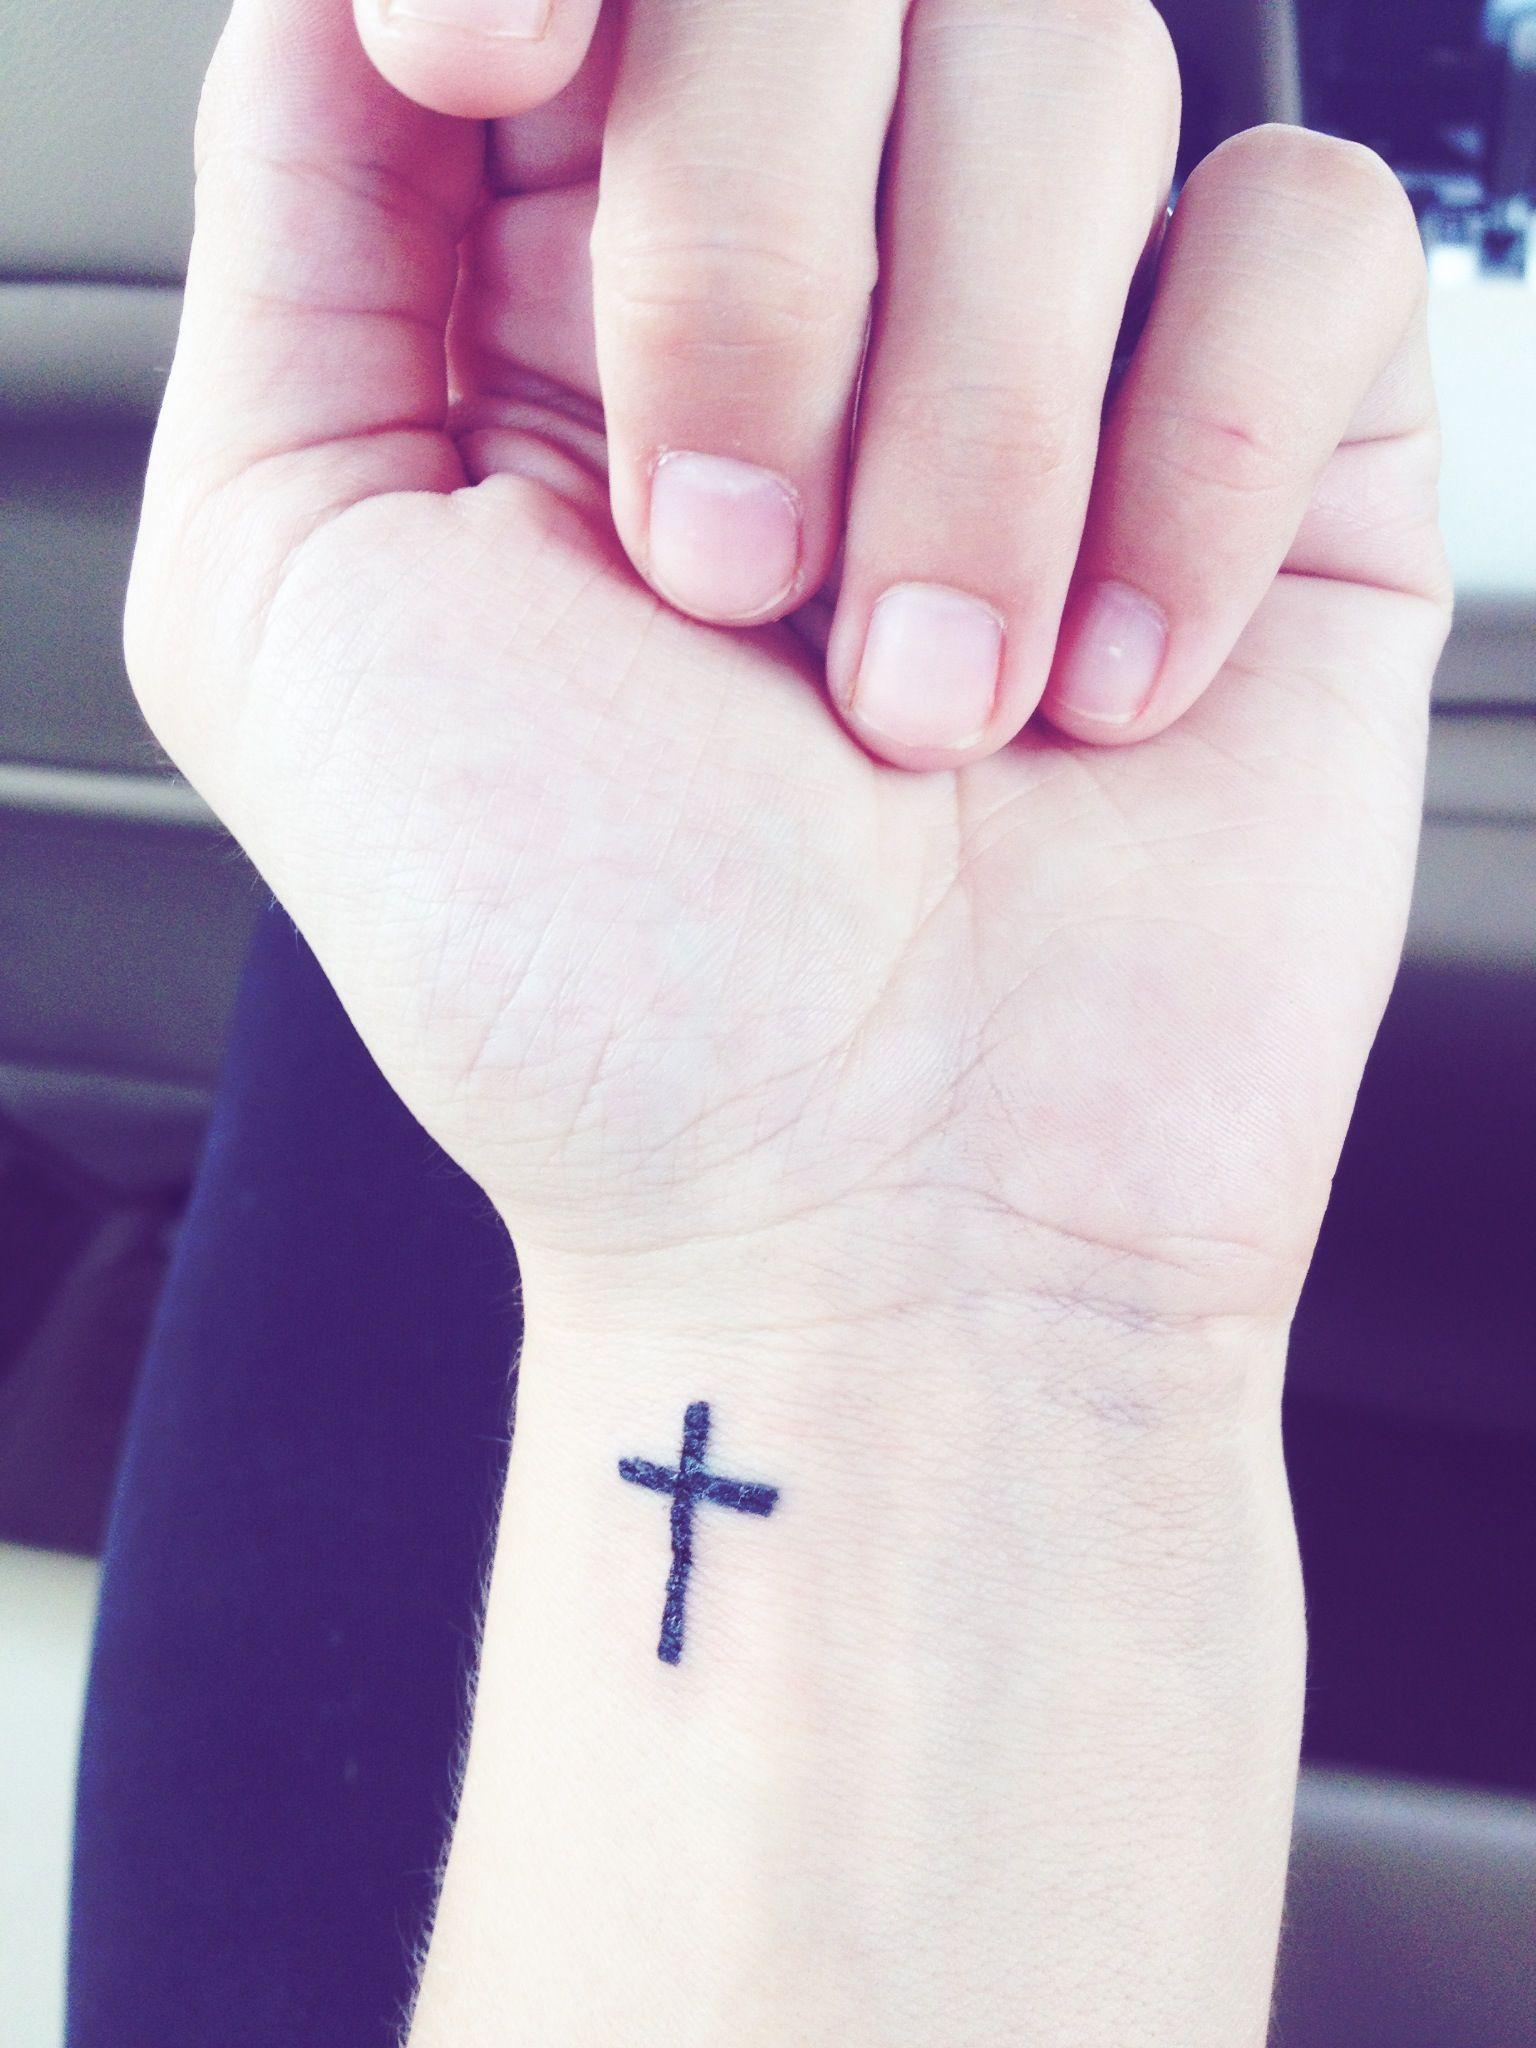 cross wrist a r t s c r a f t s